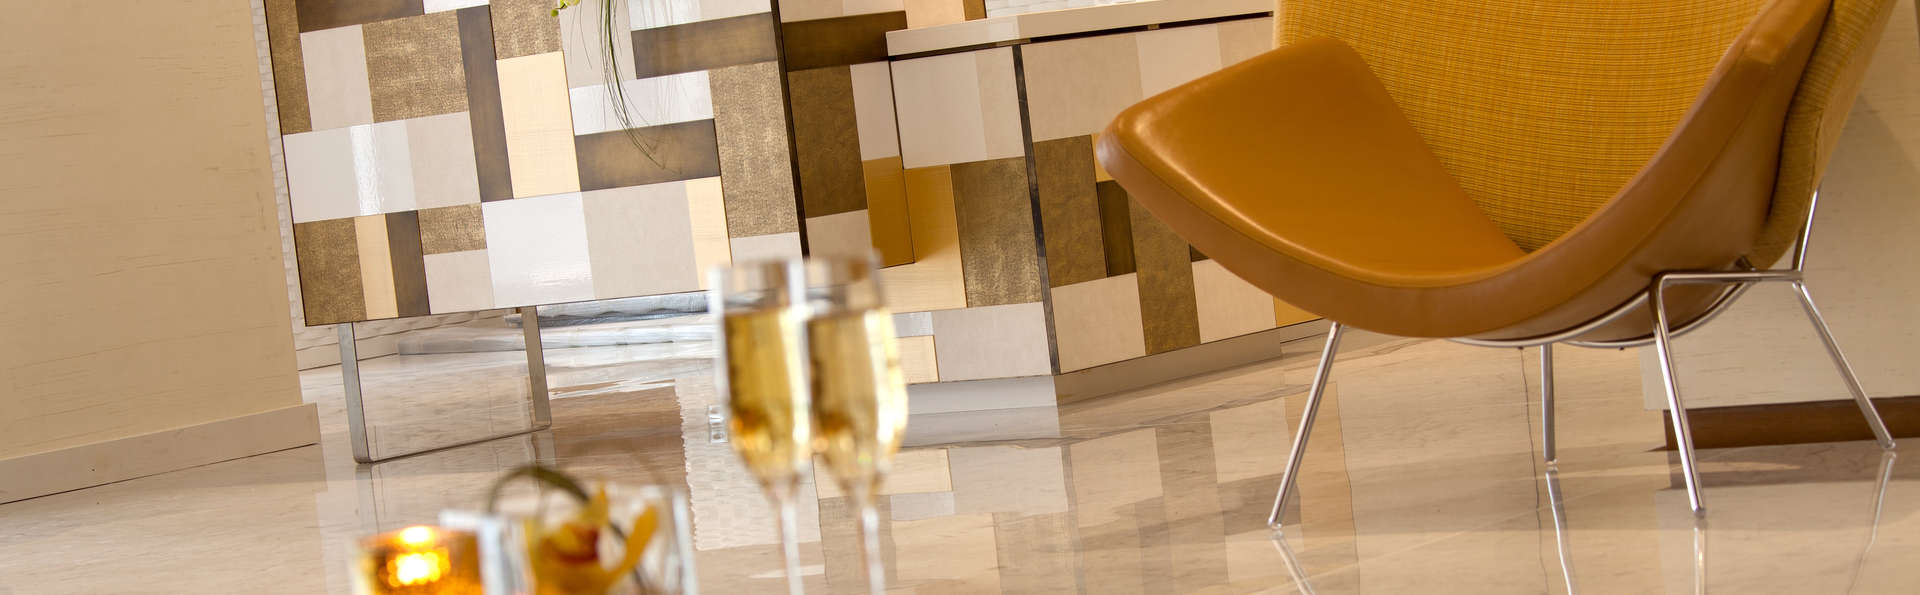 week end massage et soins aix en provence avec modelage relaxant partir de 265. Black Bedroom Furniture Sets. Home Design Ideas